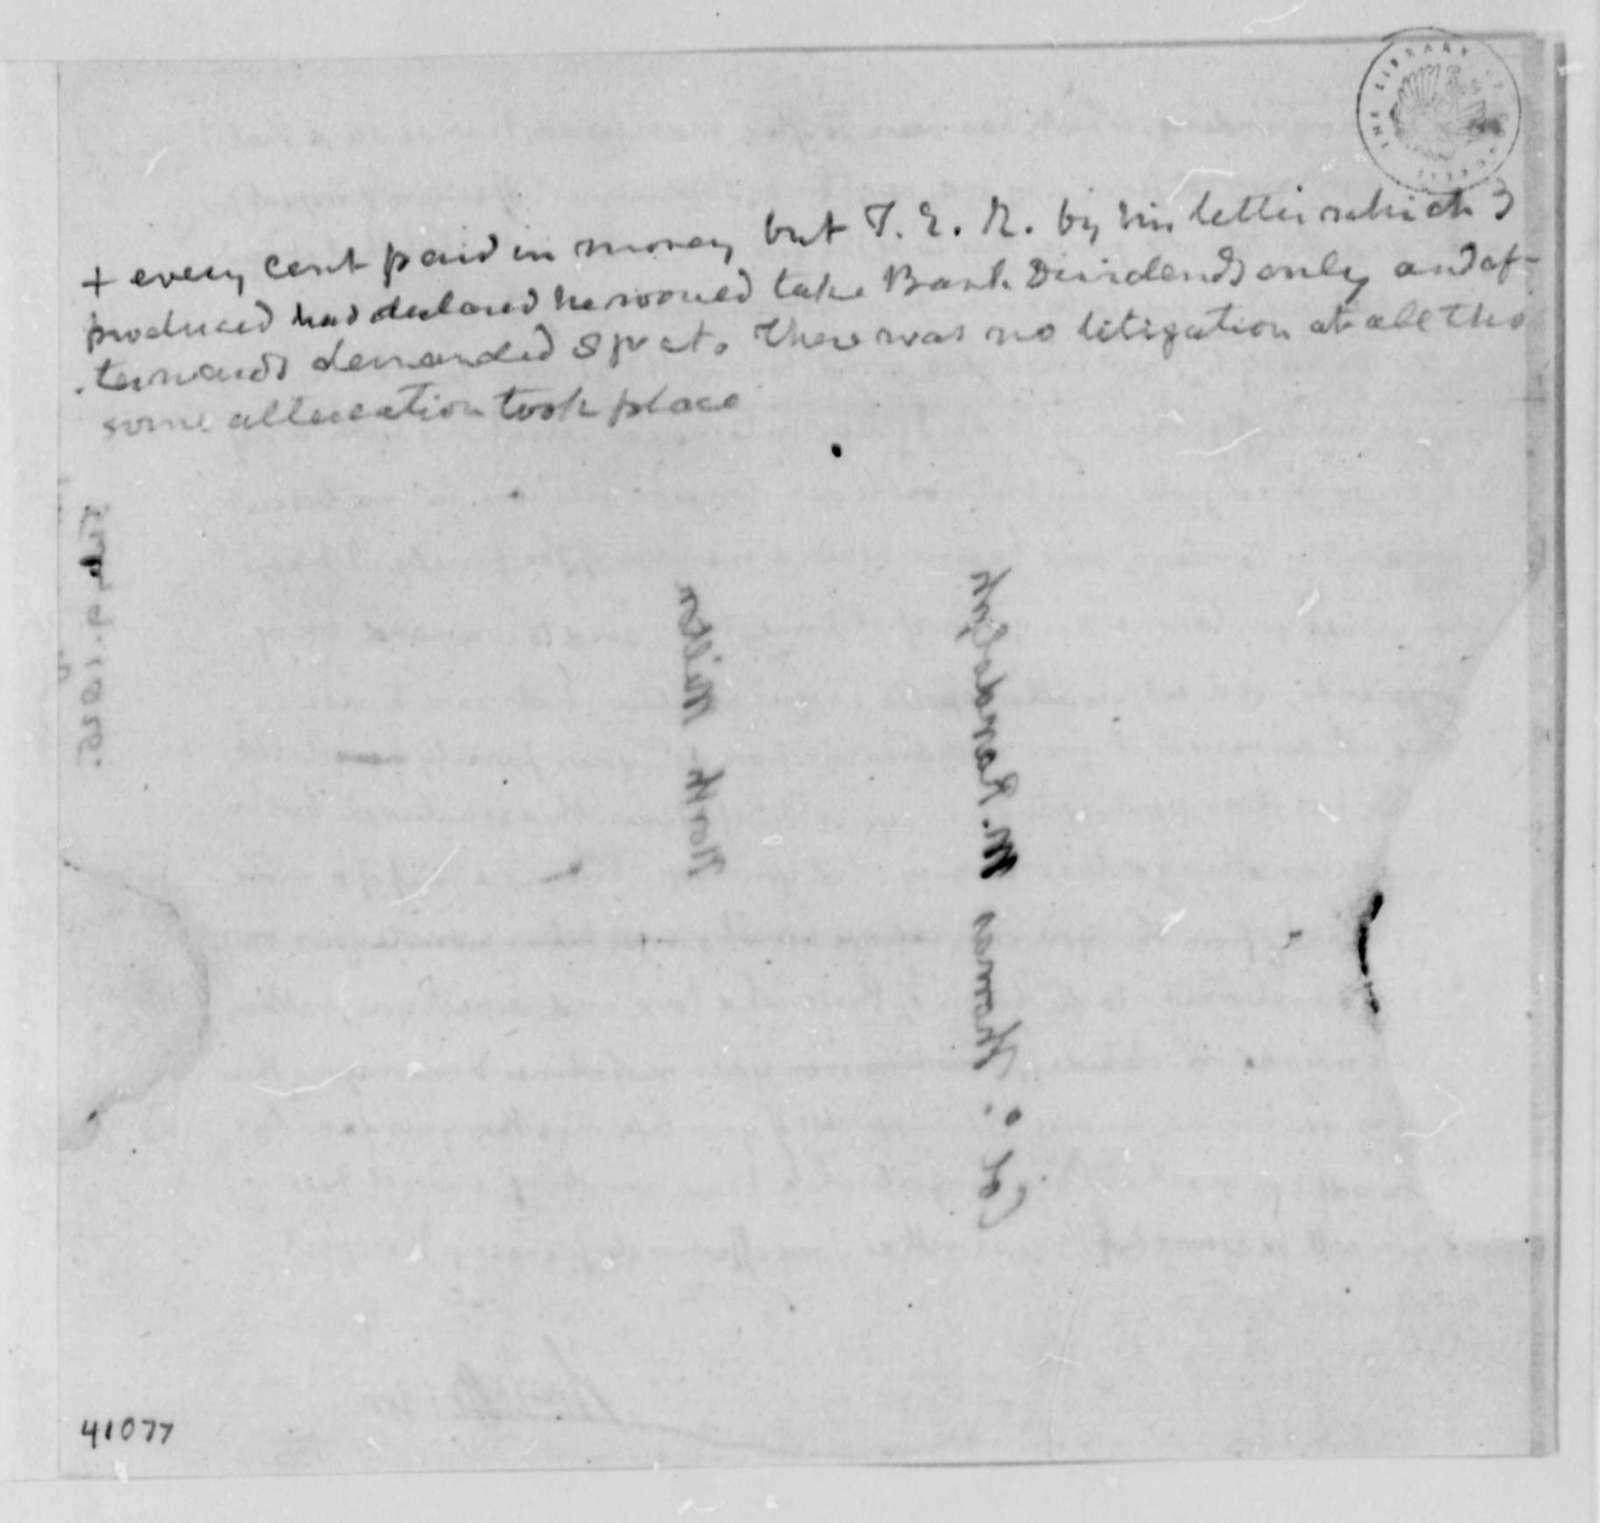 Thomas Jefferson to Thomas Mann Randolph, Jr., July 9, 1825, with Note